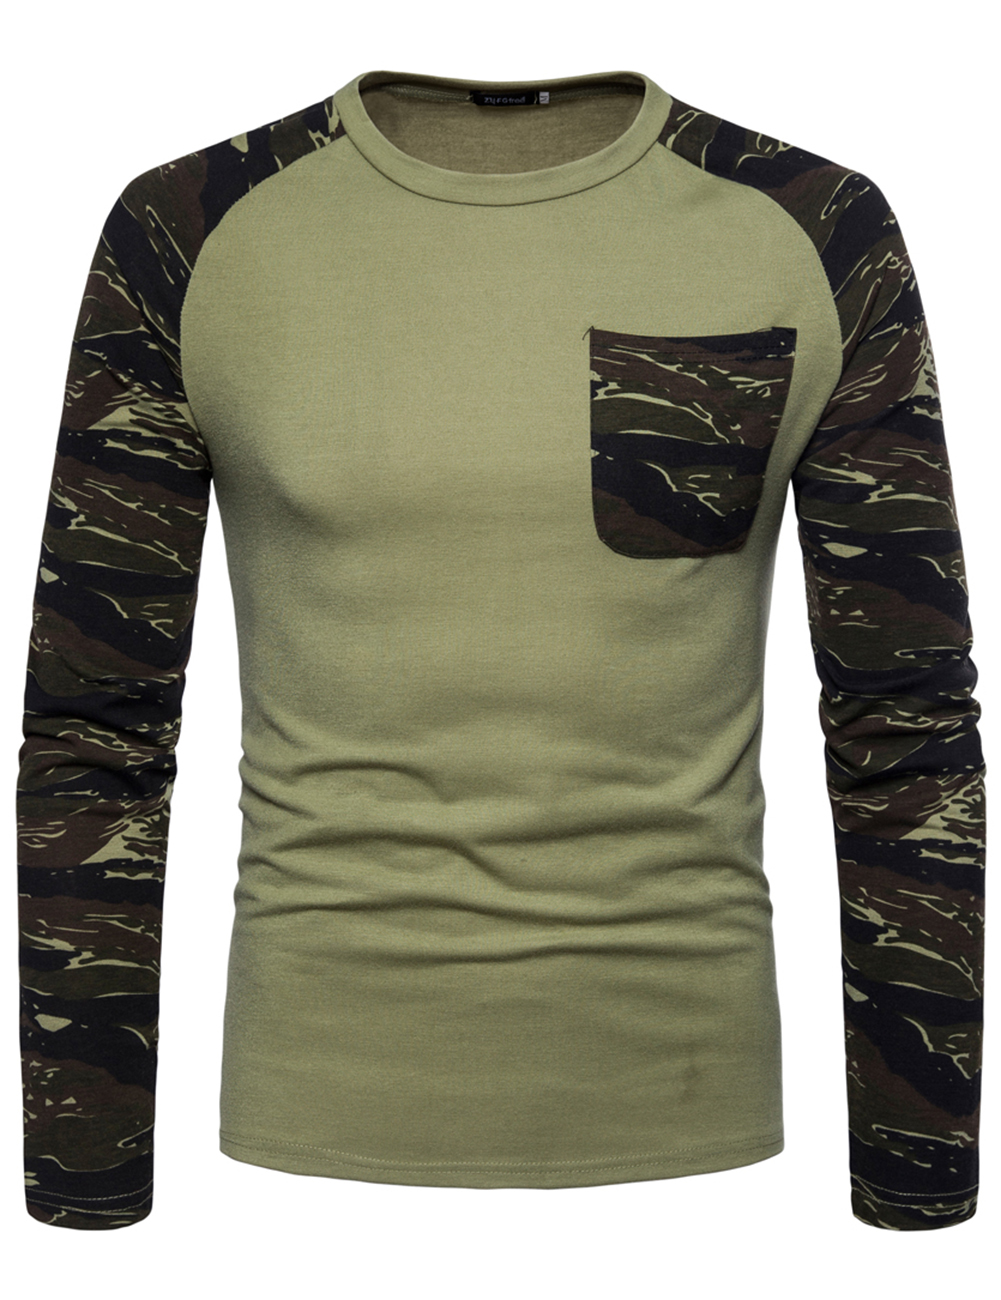 Man Stylish Long-Sleeve Sweater Camouflage Round Collar T-Shirt Tops Coat green_M